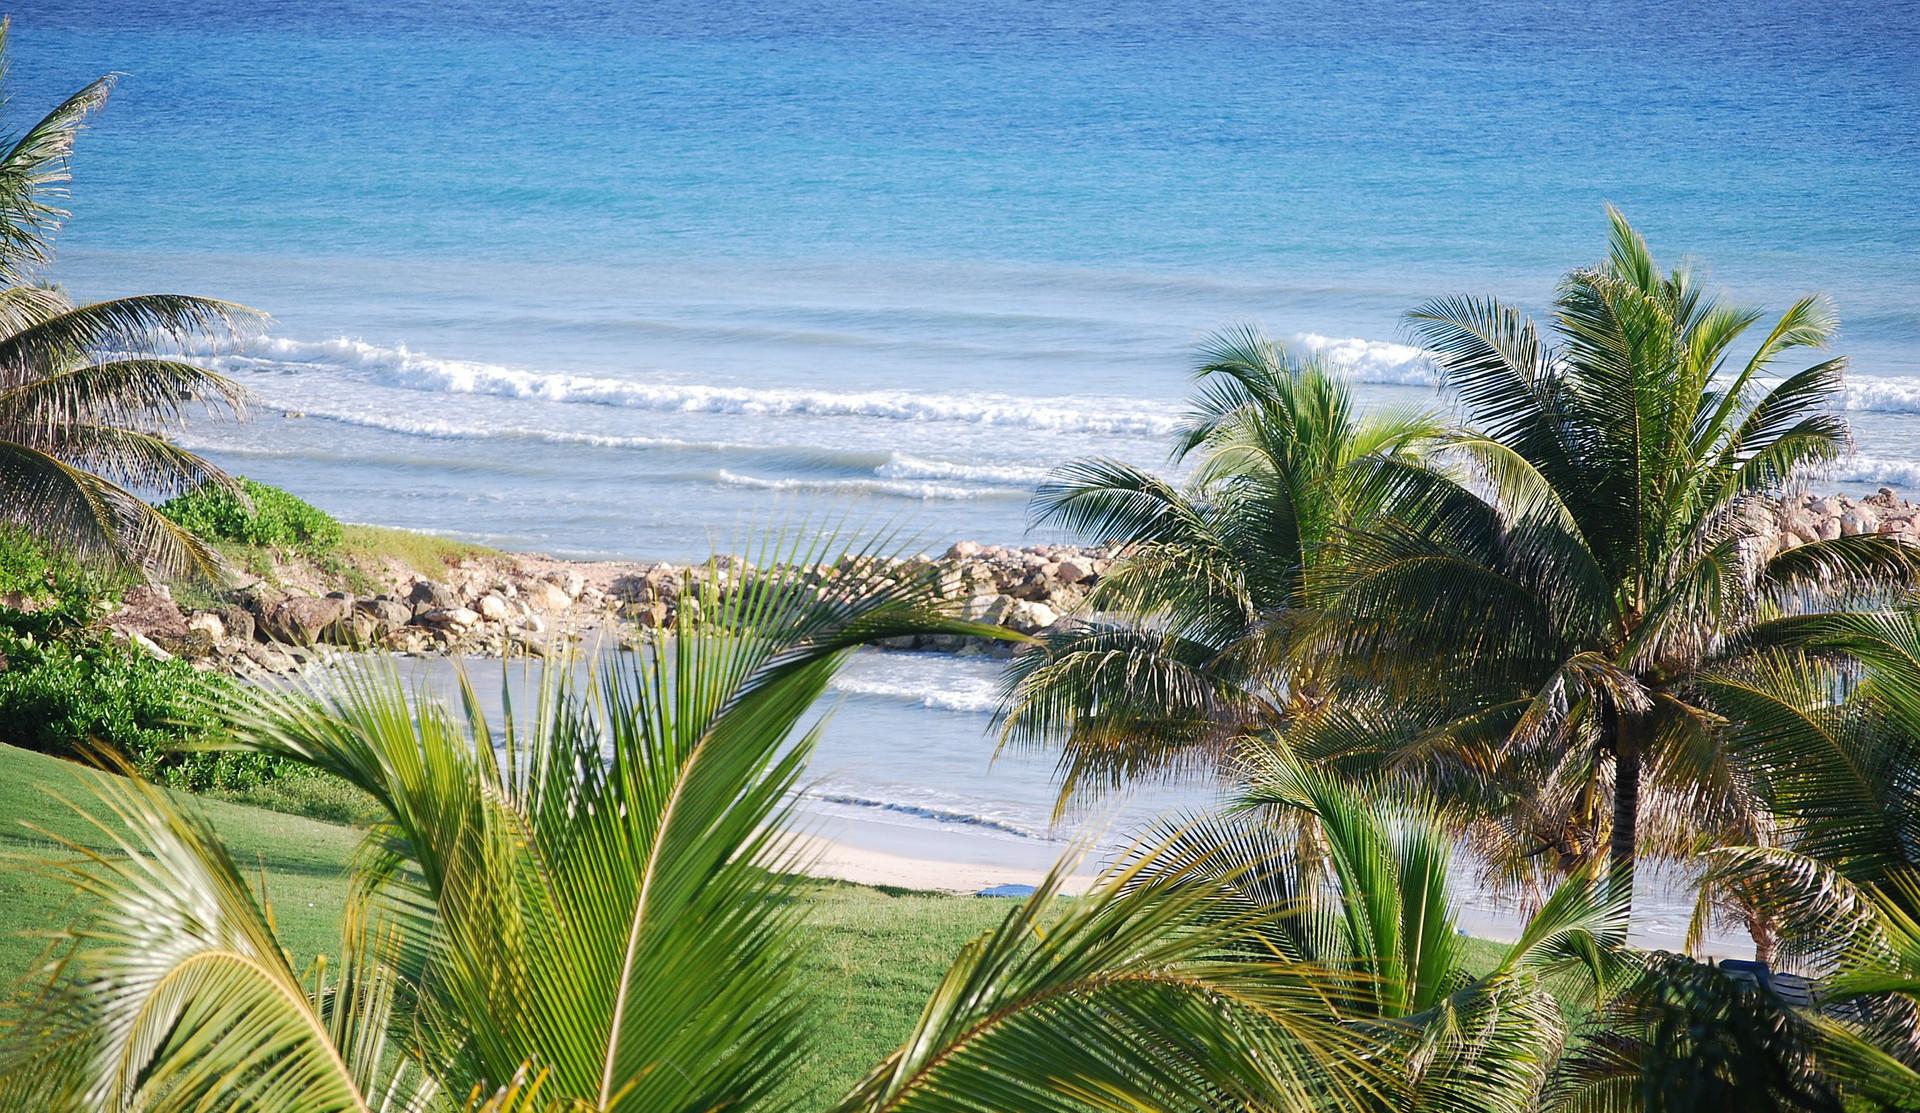 news-main-bartlett-seeks-to-position-jamaica-as-resilience-hotspot.1600860924.jpg